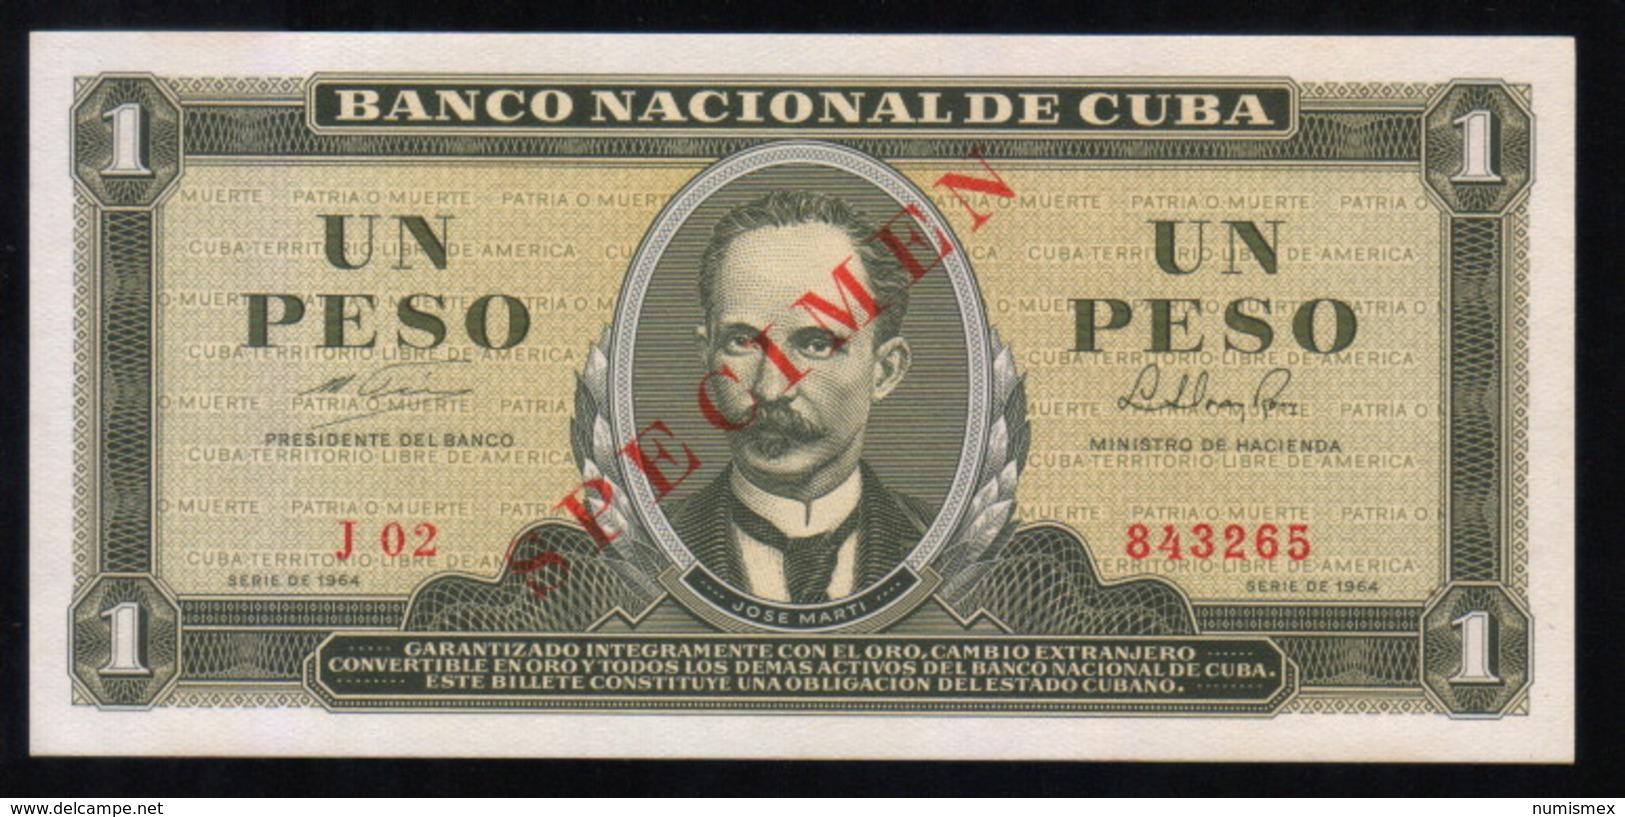 Caribe  / 1 PESO 1964 SPECIMEN ( MUESTRA ) Serie J-02 843265 UNC - Cuba